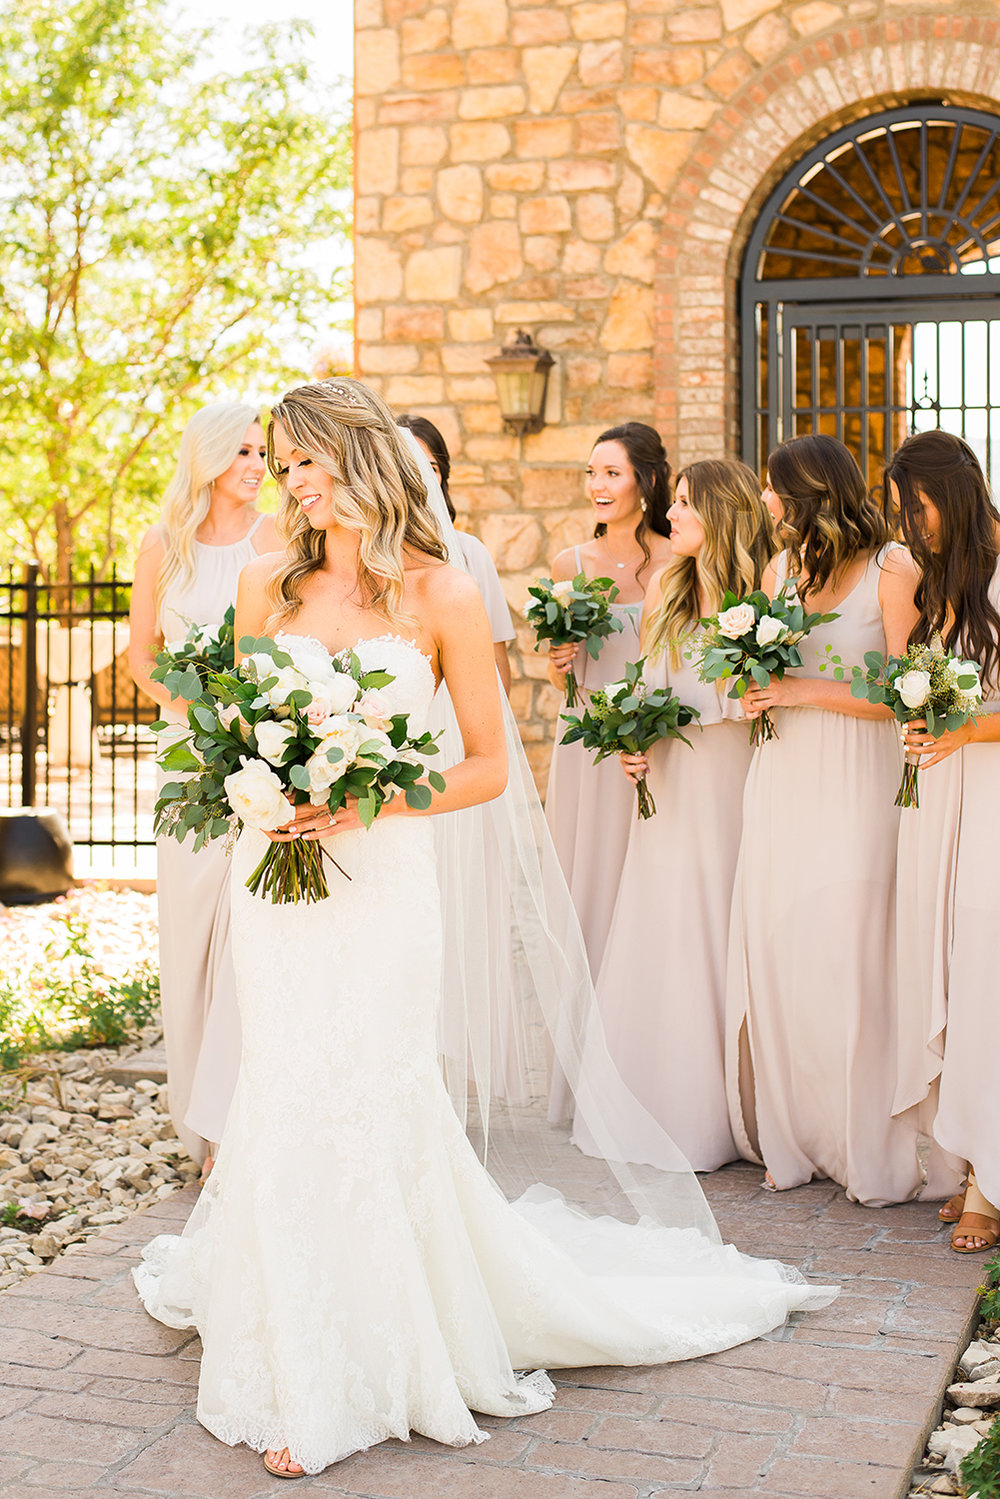 The-Retreat-At-Solterra-Wedding-Denver-Wedding-Photographer-15.jpg